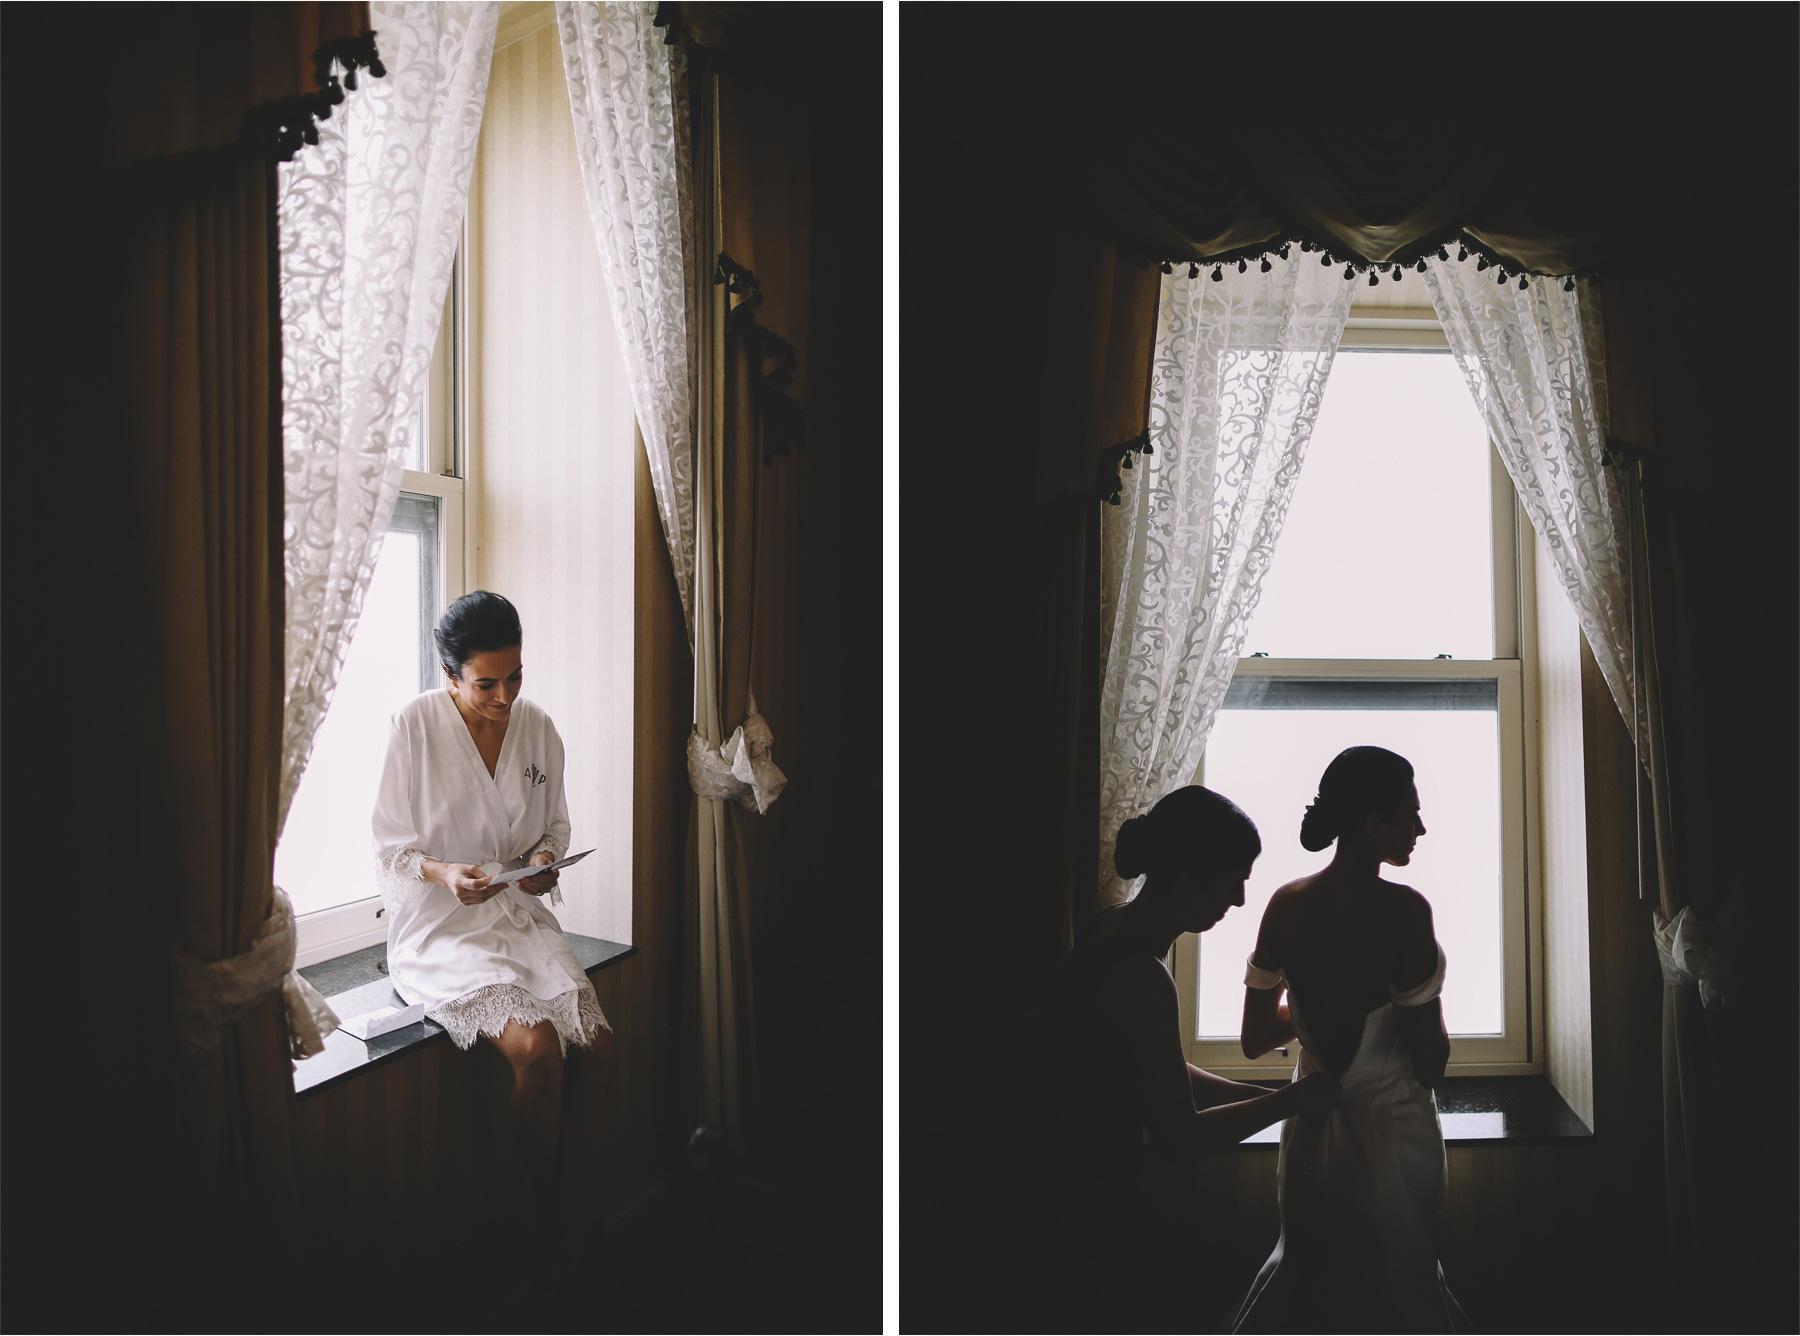 02-Minneapolis-Minnesota-Wedding-Photographer-Andrew-Vick-Photography-Bride-Morning-Window-Allison-and-Steve.jpg